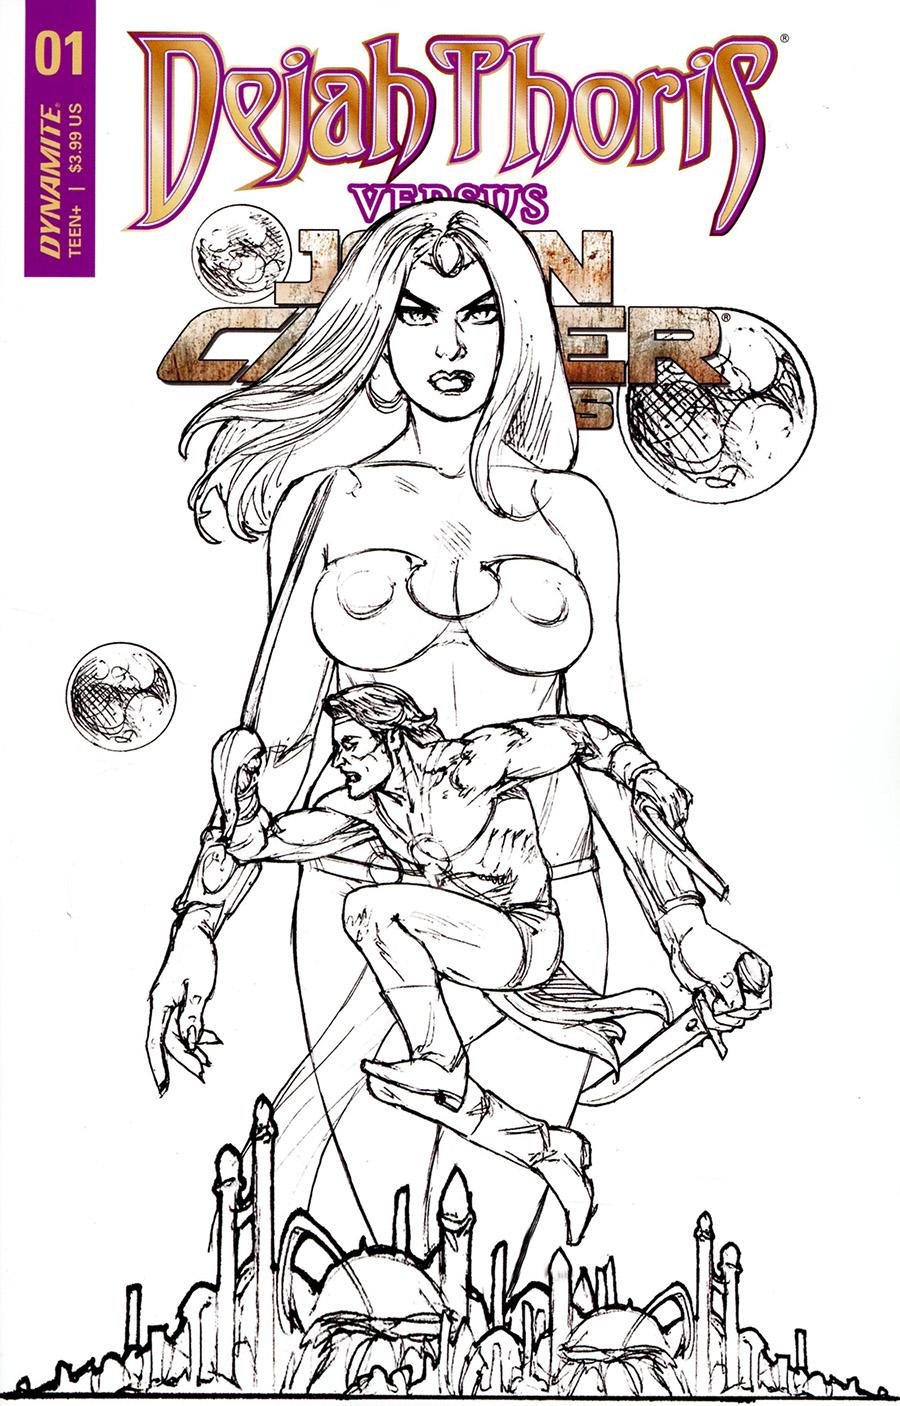 Dejah Thoris Versus John Carter Of Mars #1 Cover G Incentive Joseph Michael Linsner Pencils Cover